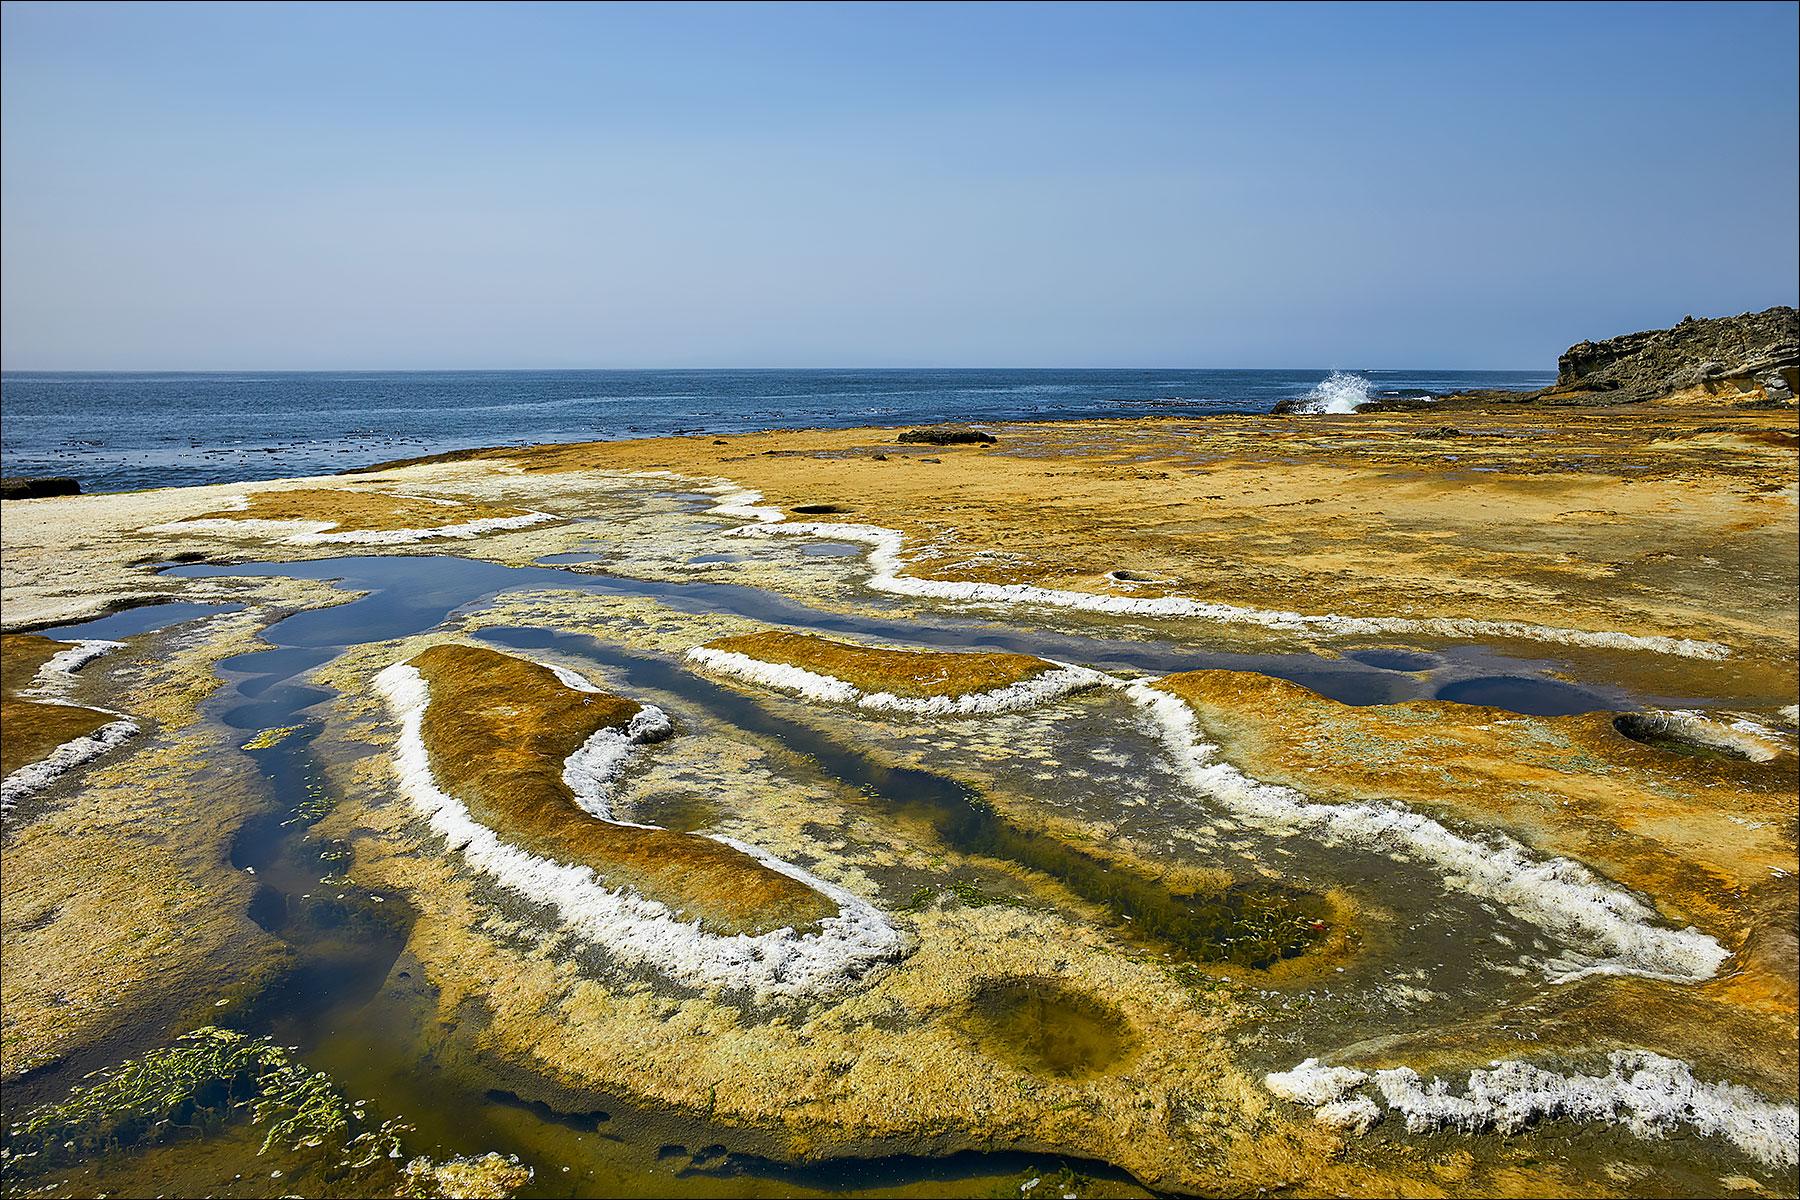 tom baird beach ©johncameron.ca